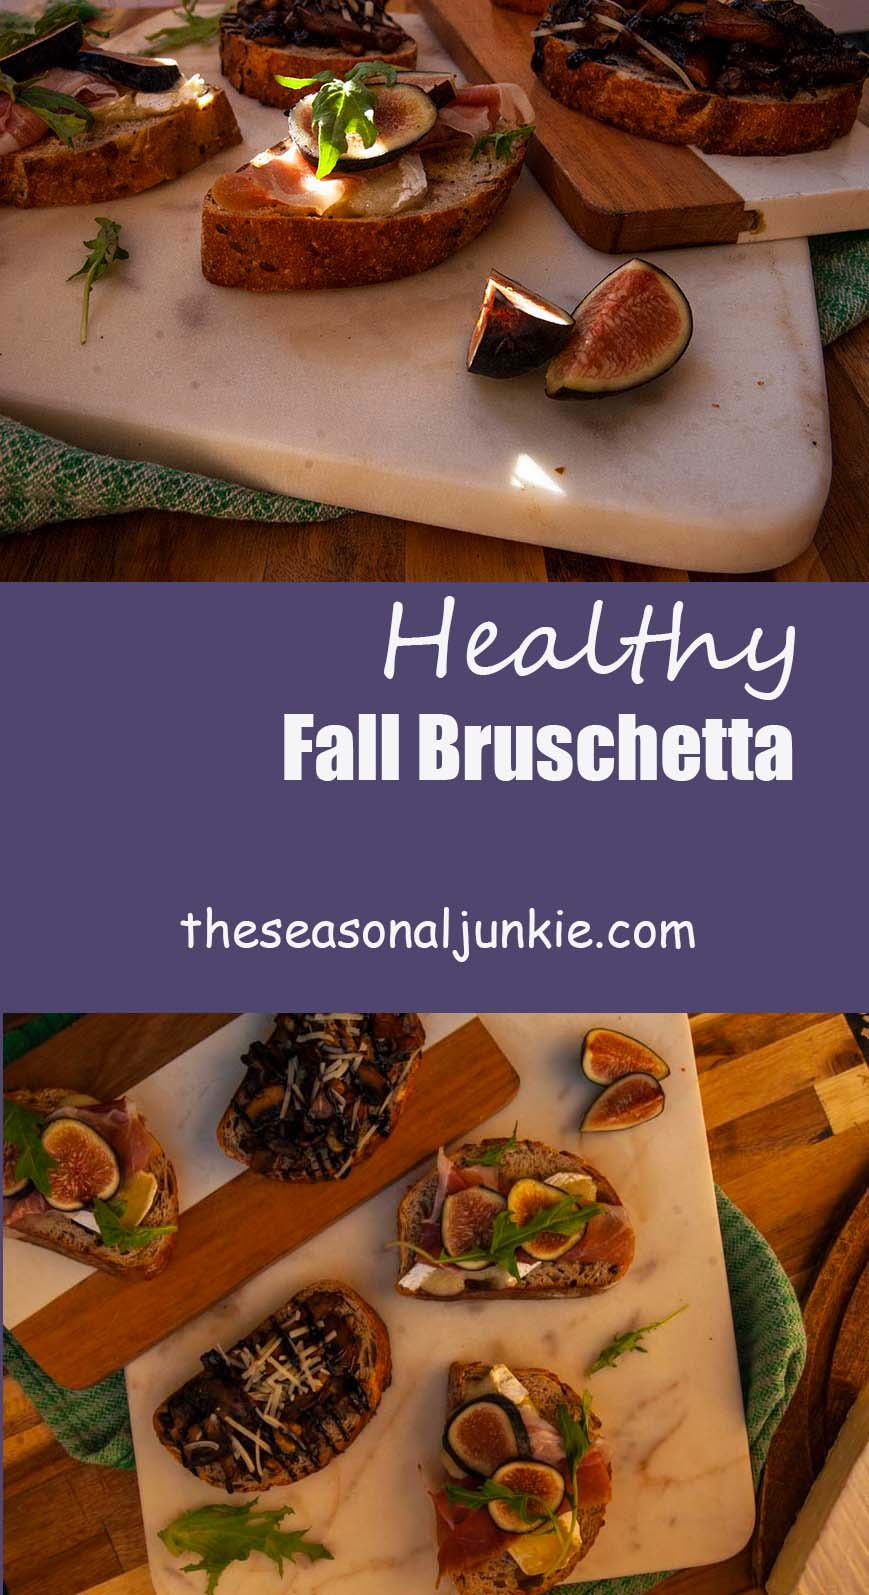 Healthy Bruschetta-The Seasonal Junkie